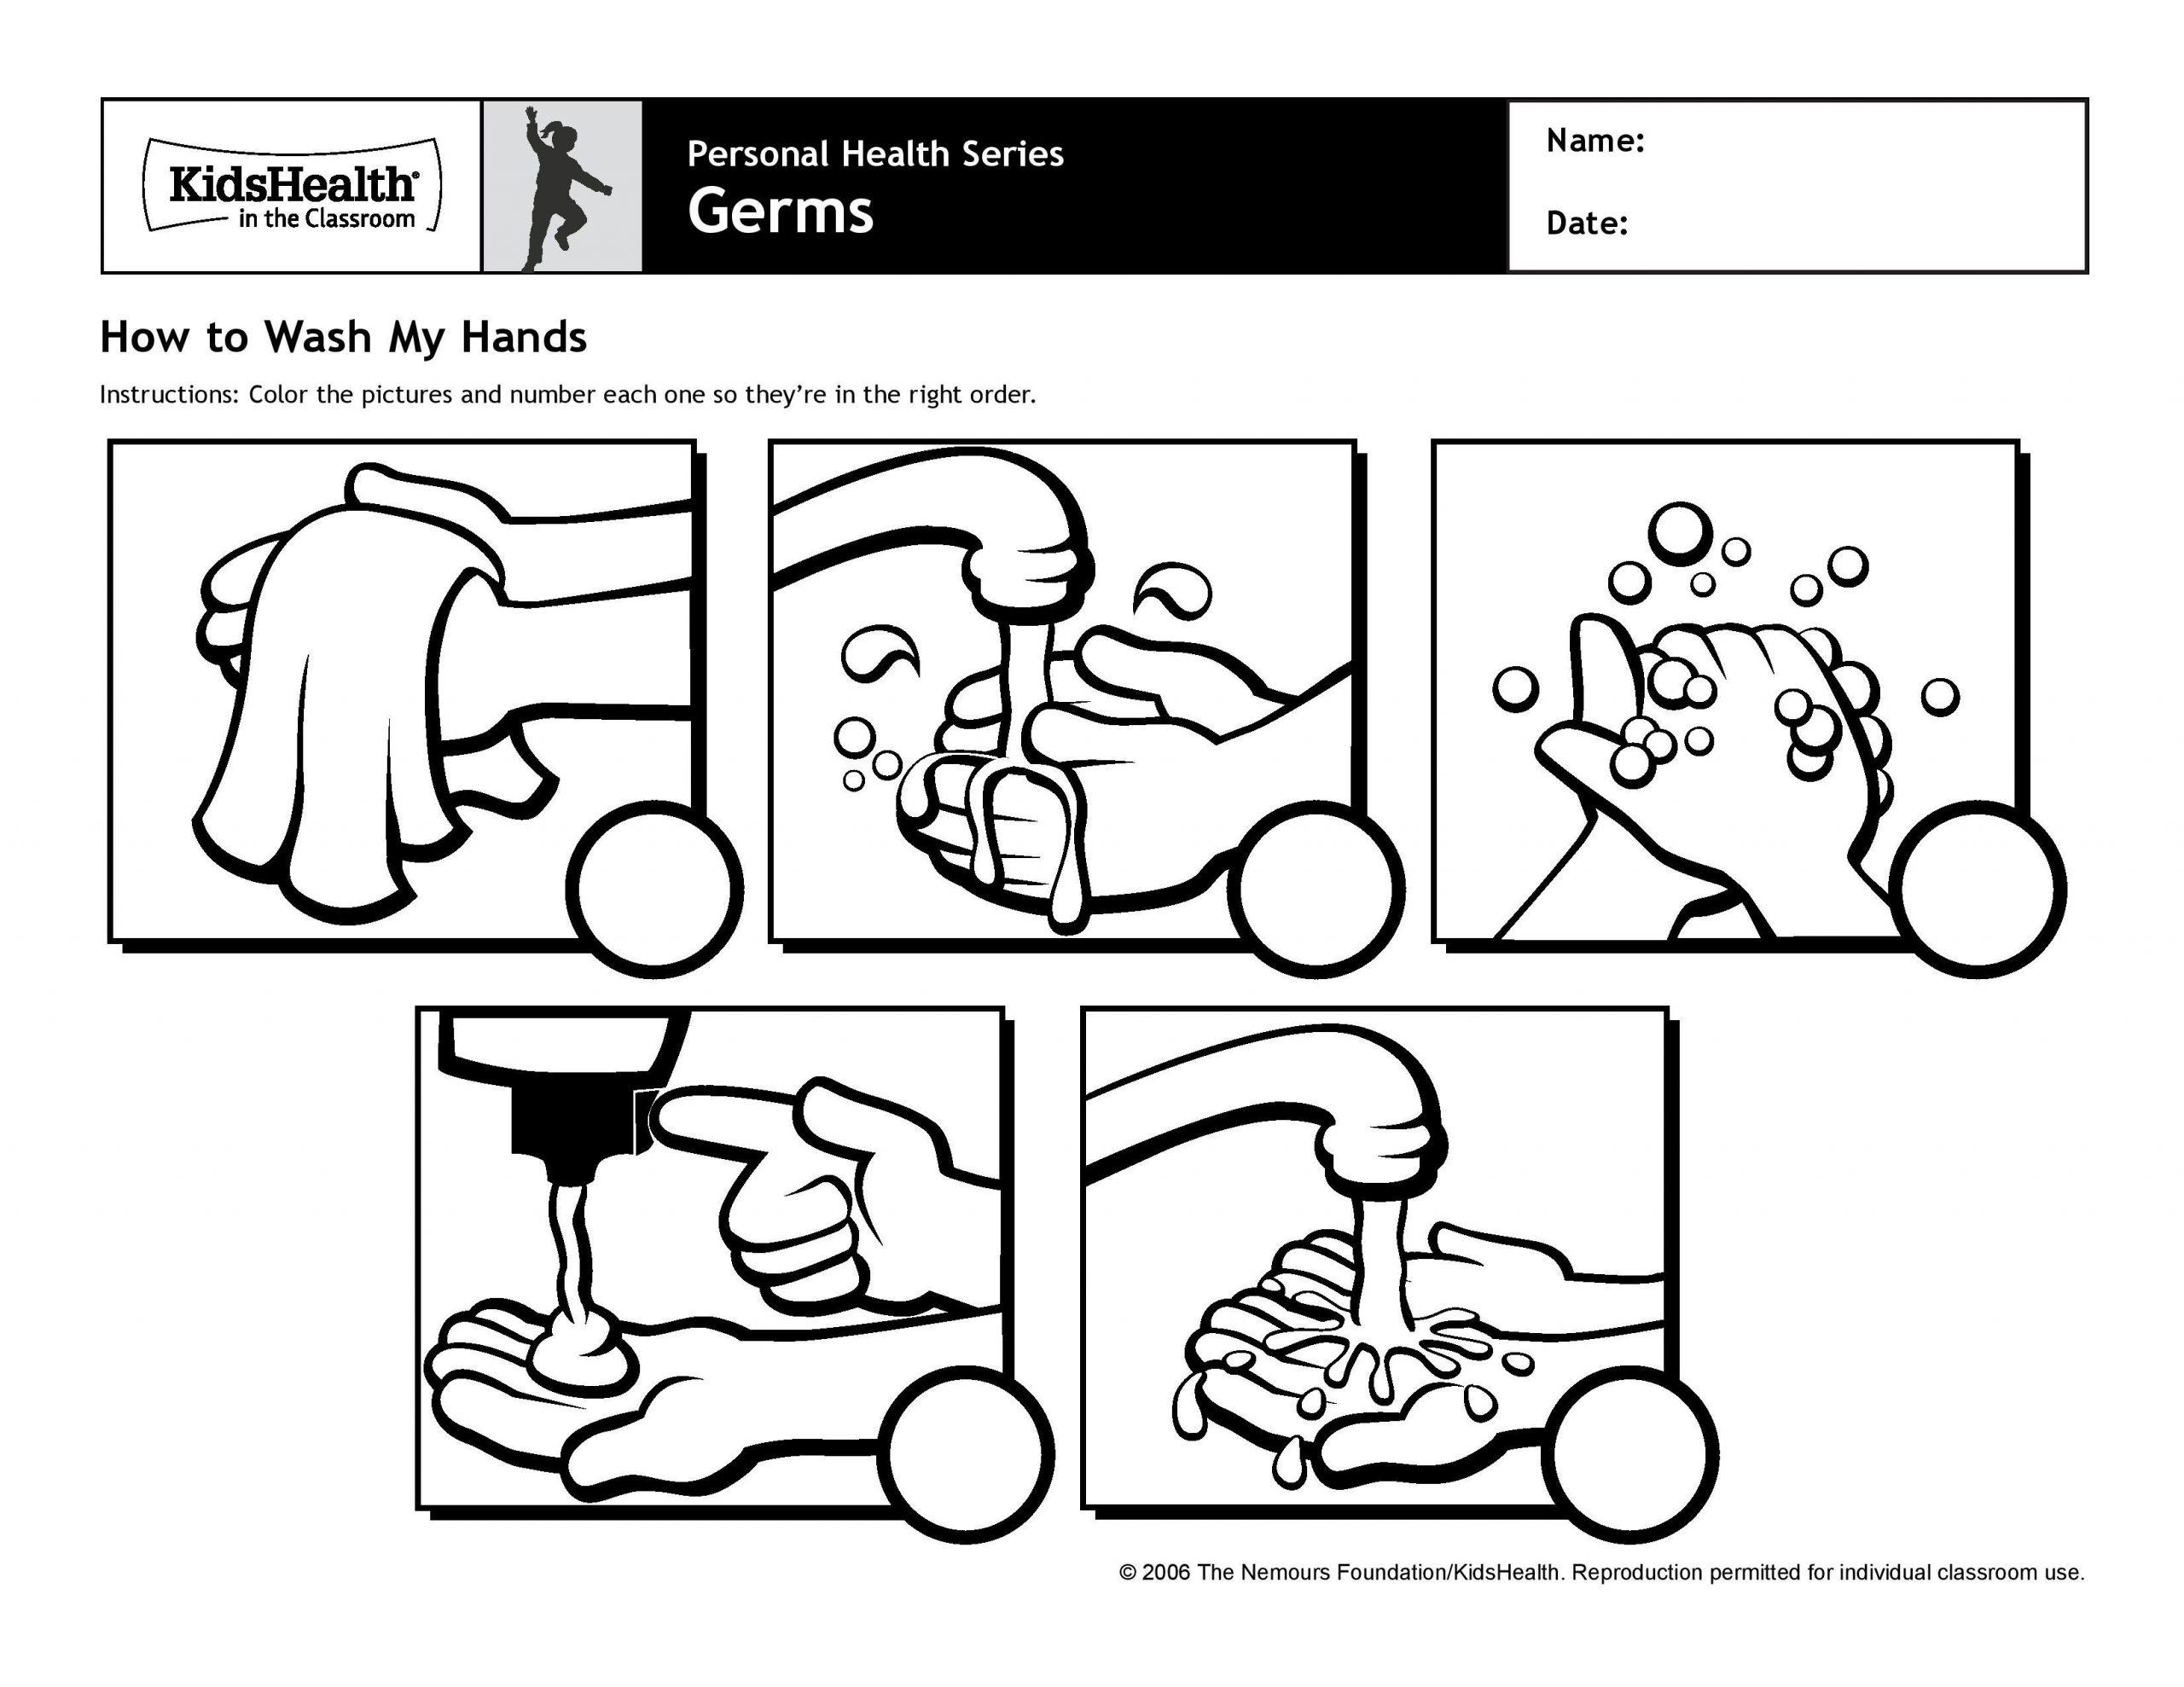 Preschool Worksheets Images 3